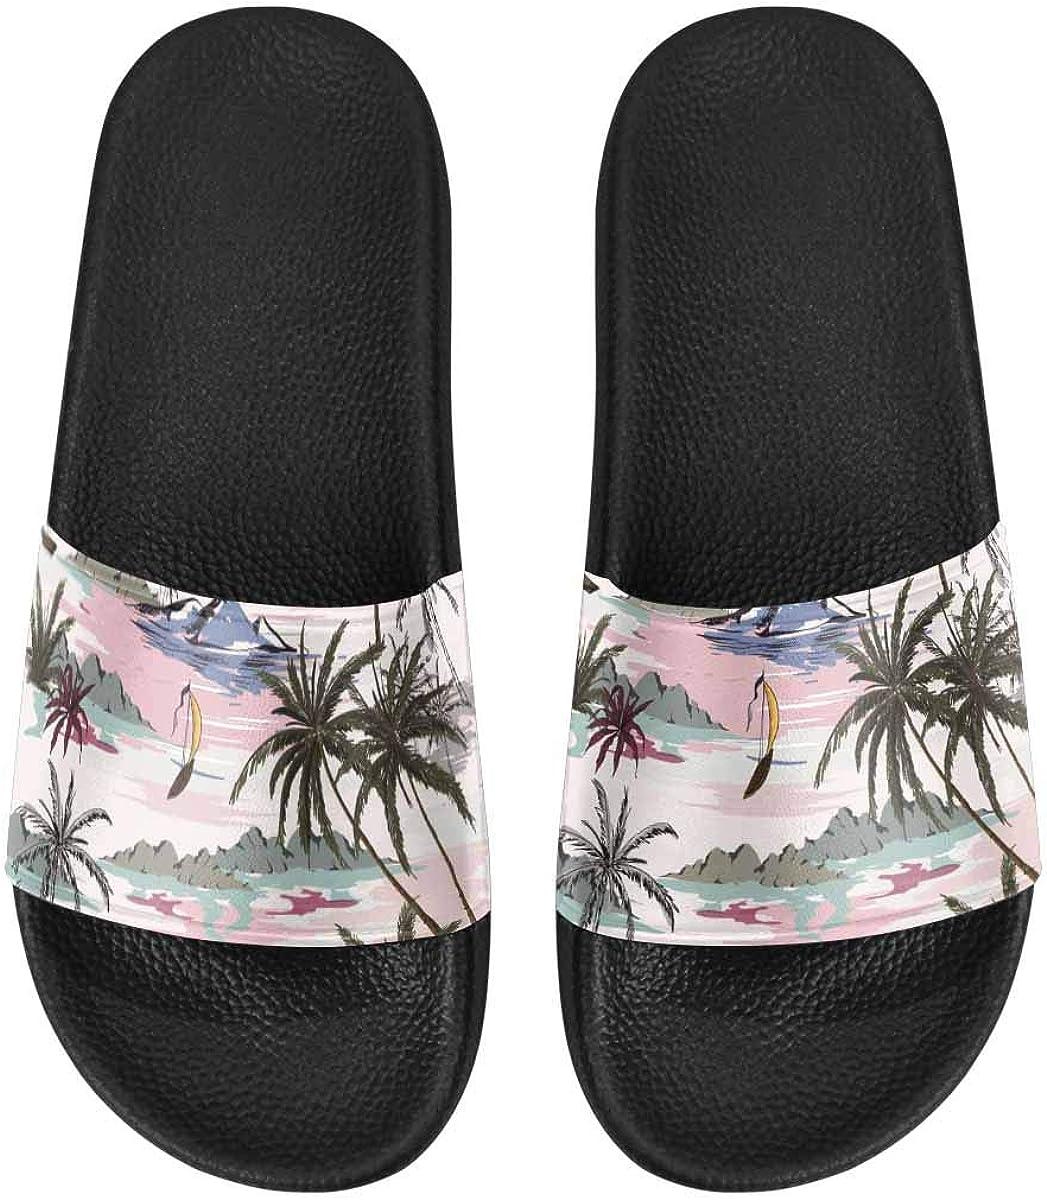 INTERESTPRINT Walking Sandals Beach Shoes for Women US6~US12 Lan